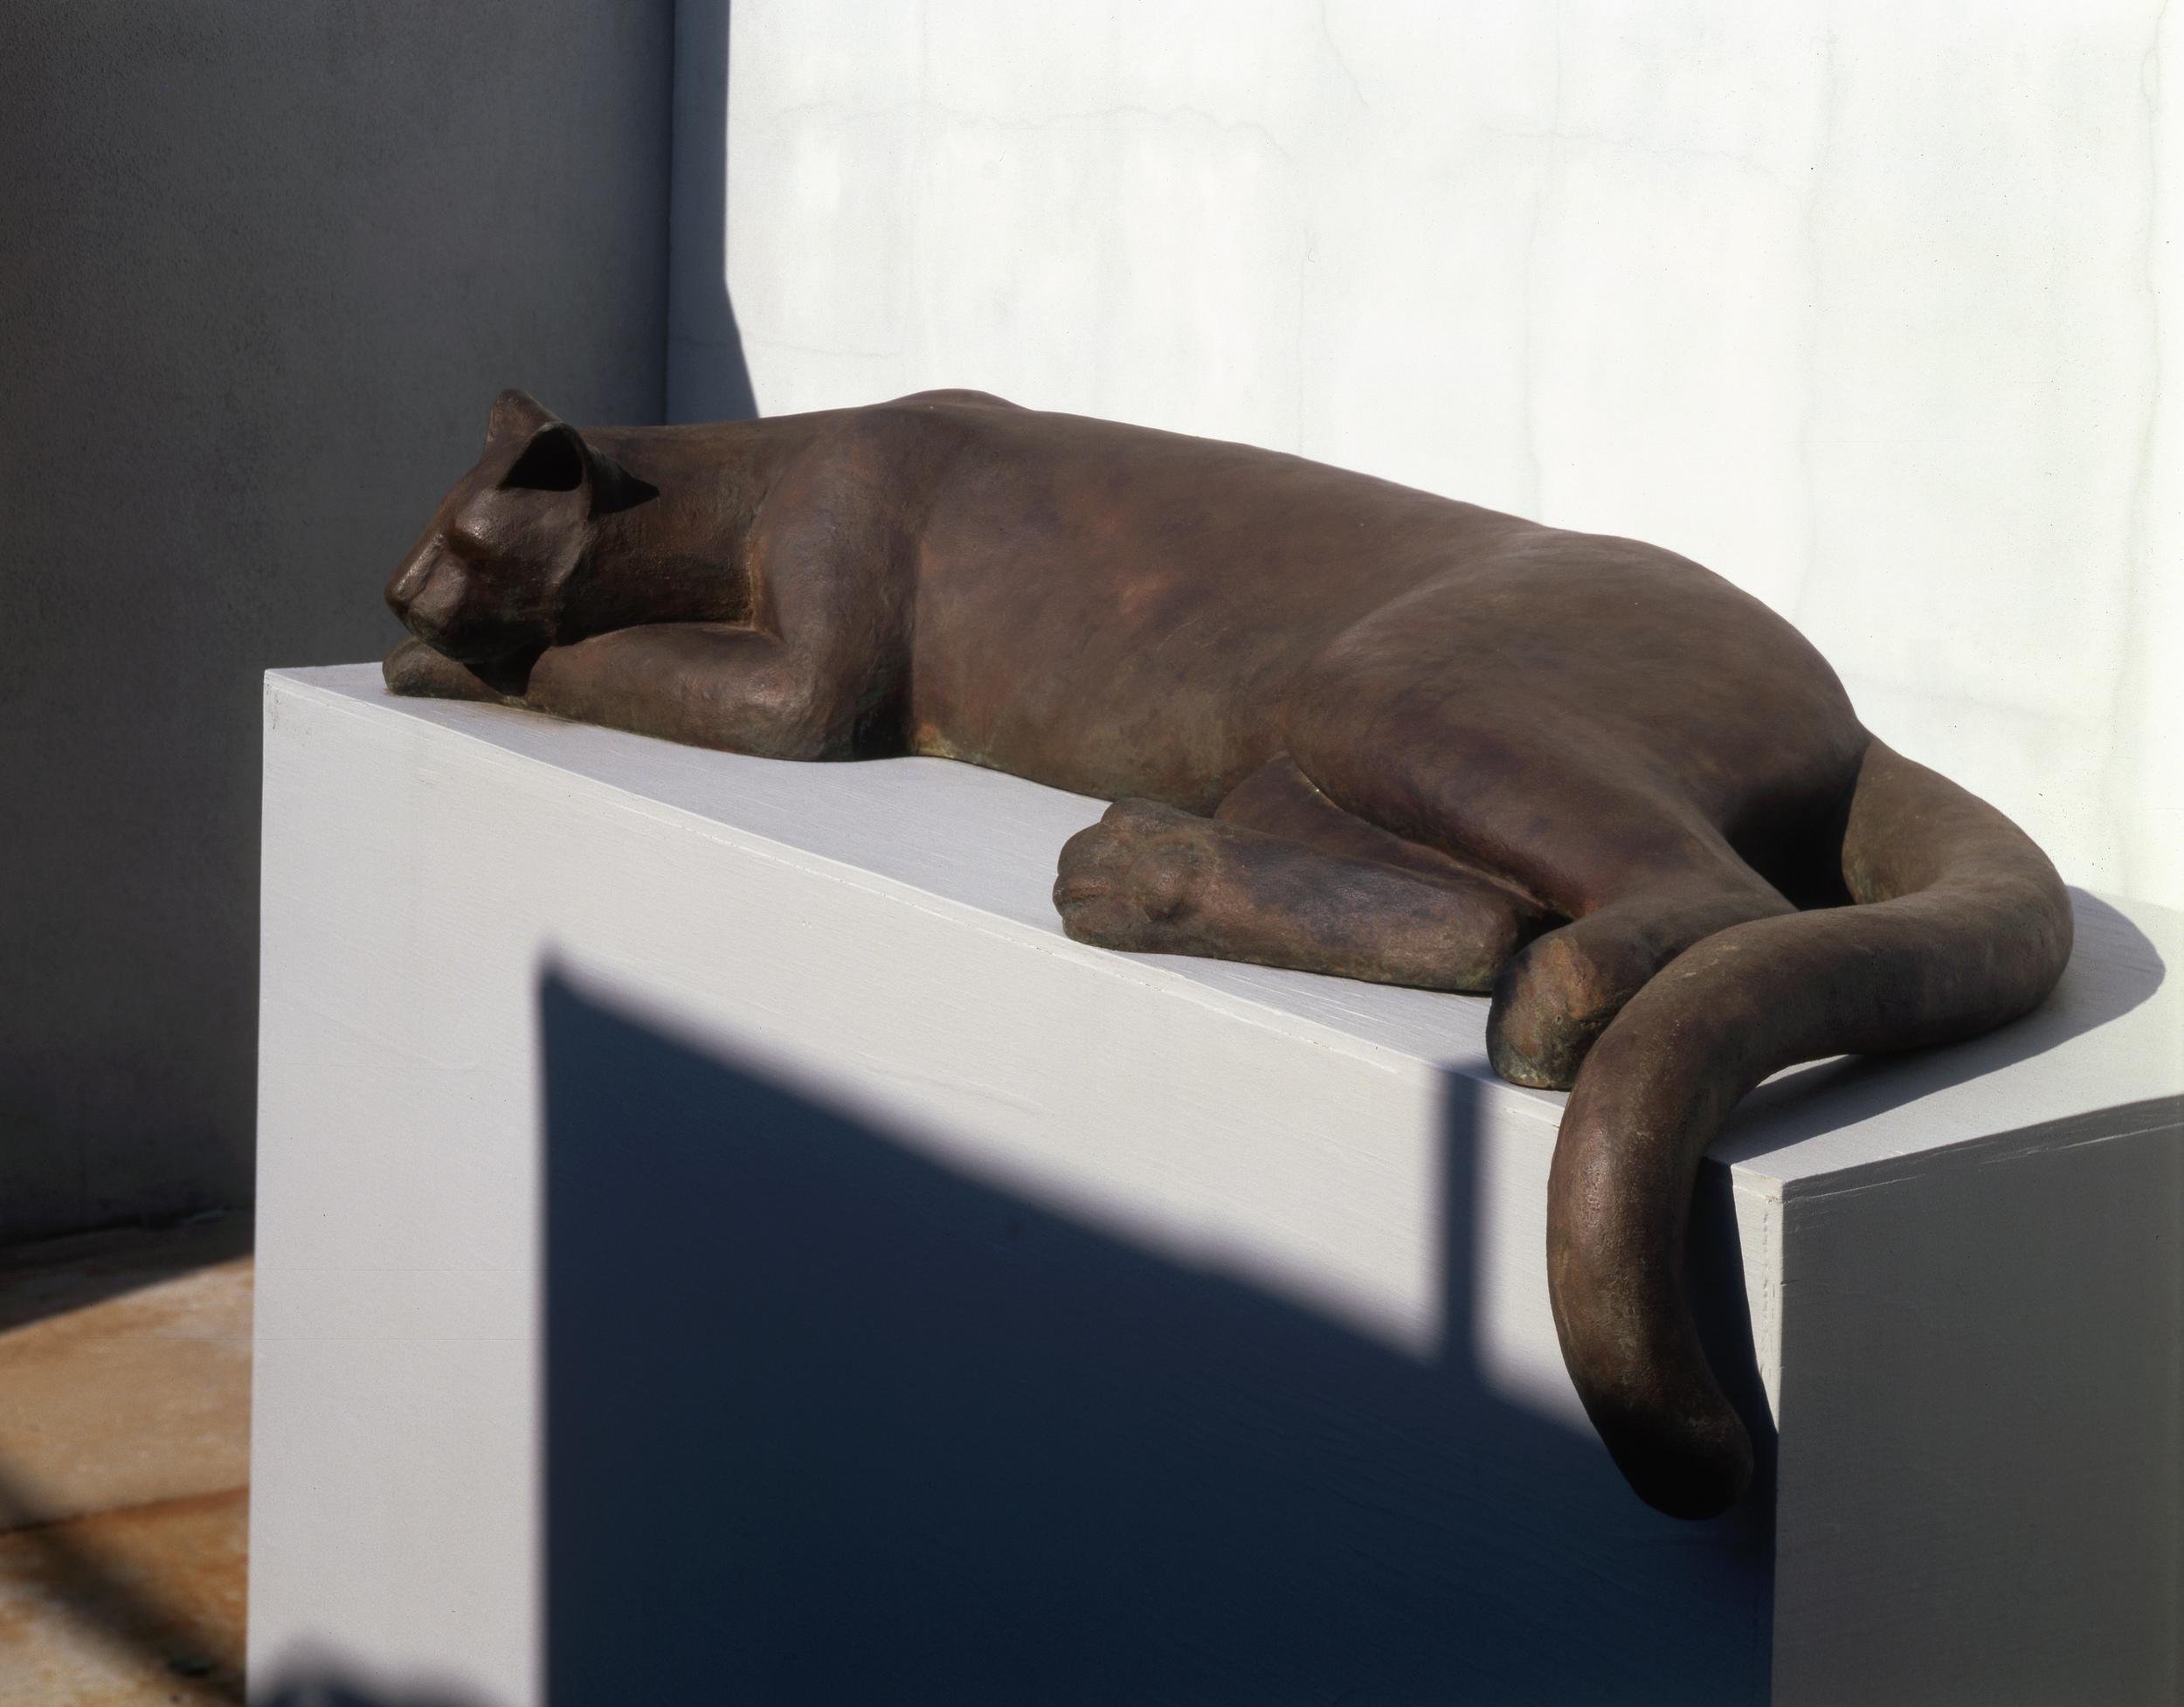 Cougar II